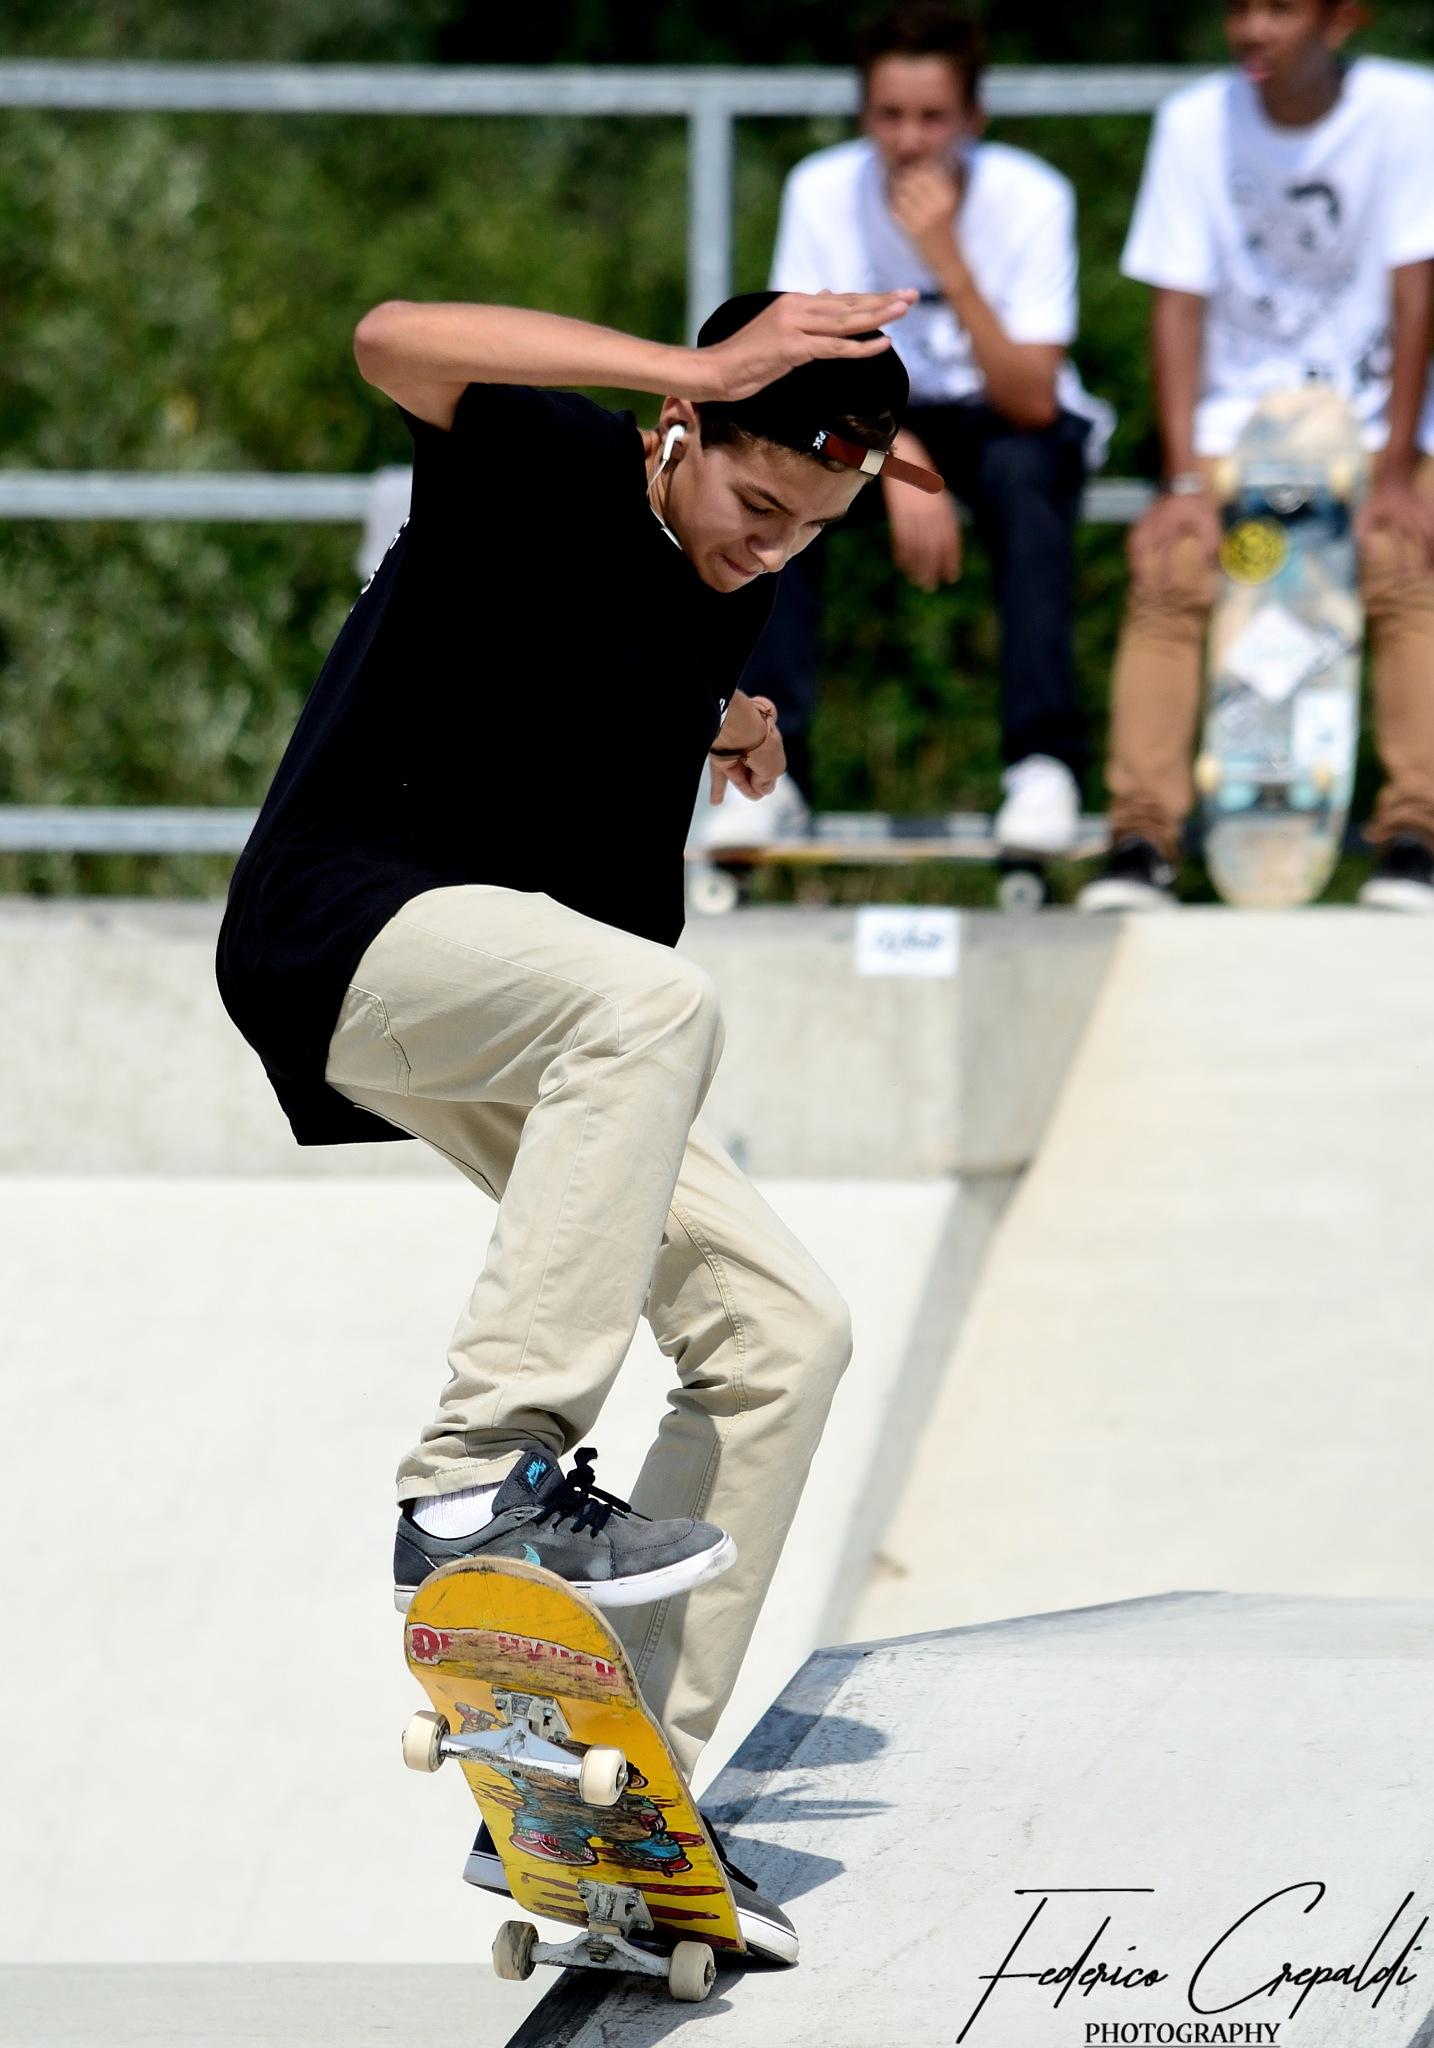 Skate 2 by Federico Crepaldi